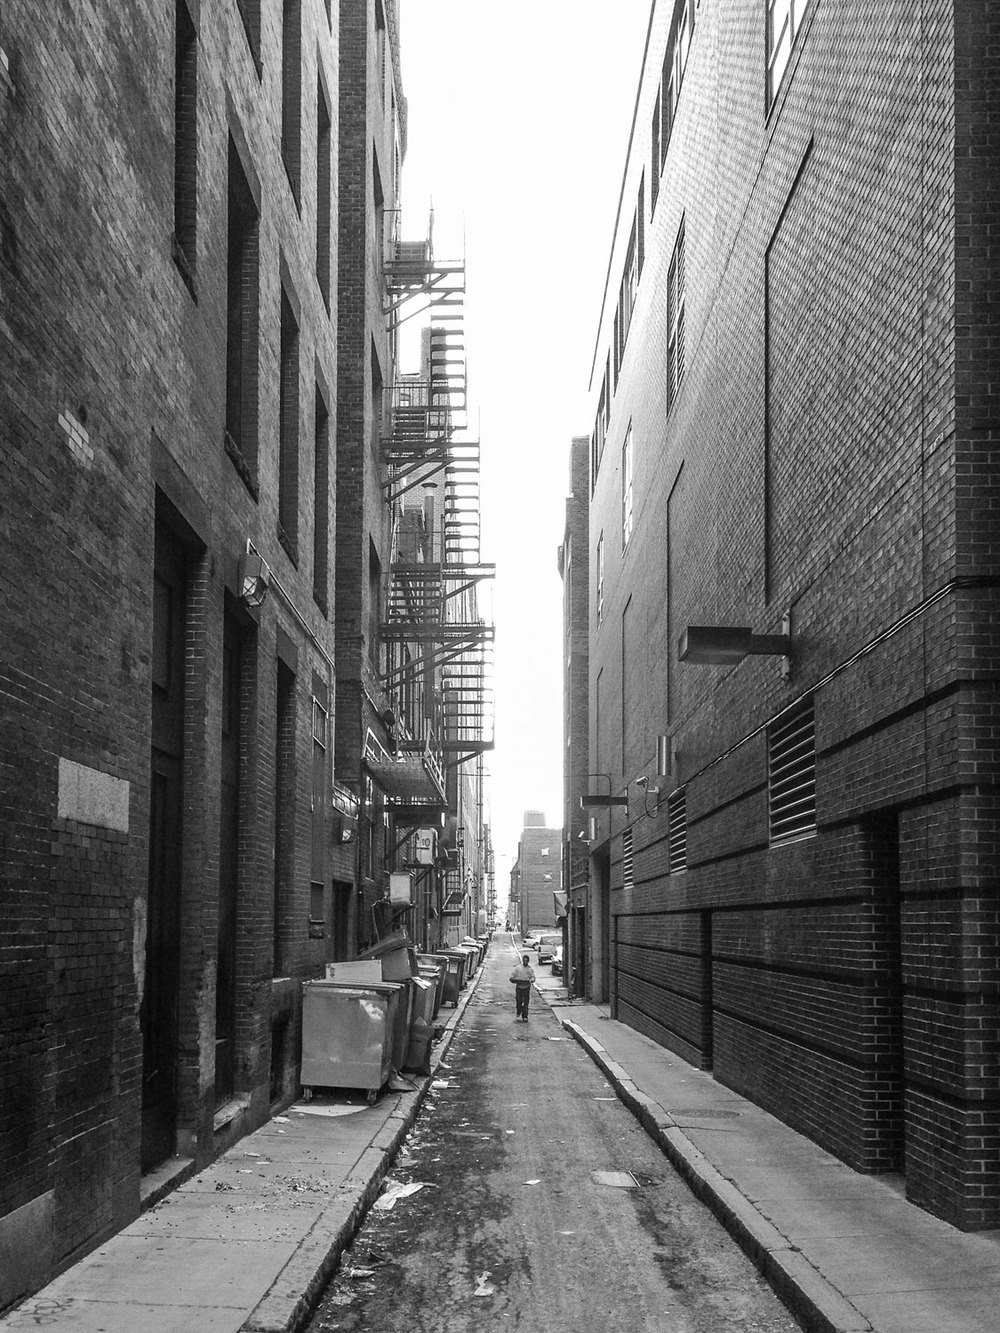 Christian-Schaffer-Massachusetts-Boston-Newbury-Street-002.jpg